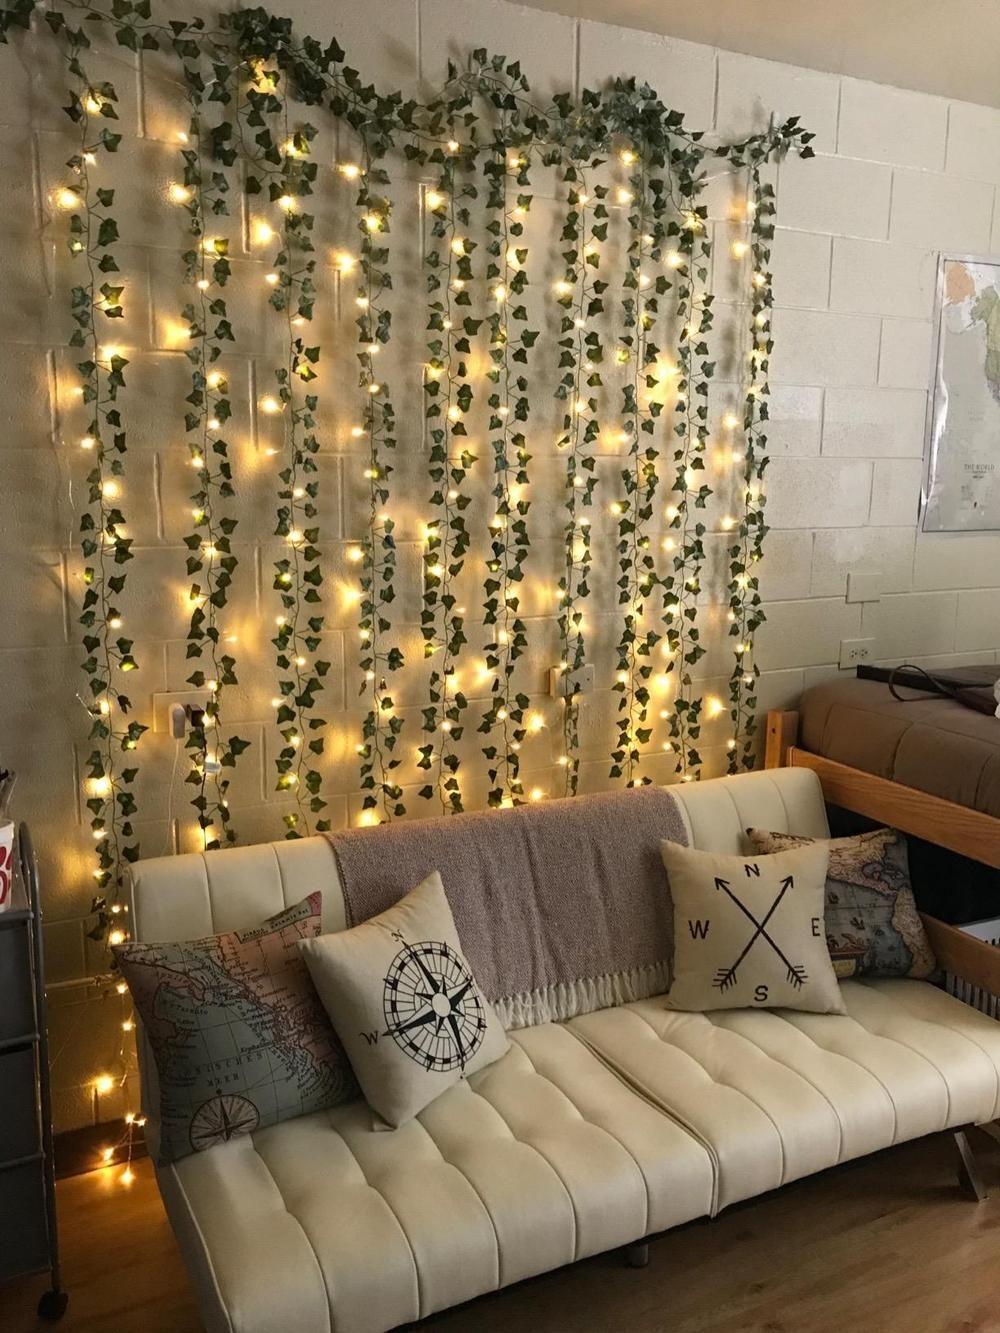 Led Wall Vine Lights In 2020 Dorm Room Decor Aesthetic Room Decor Aesthetic Rooms